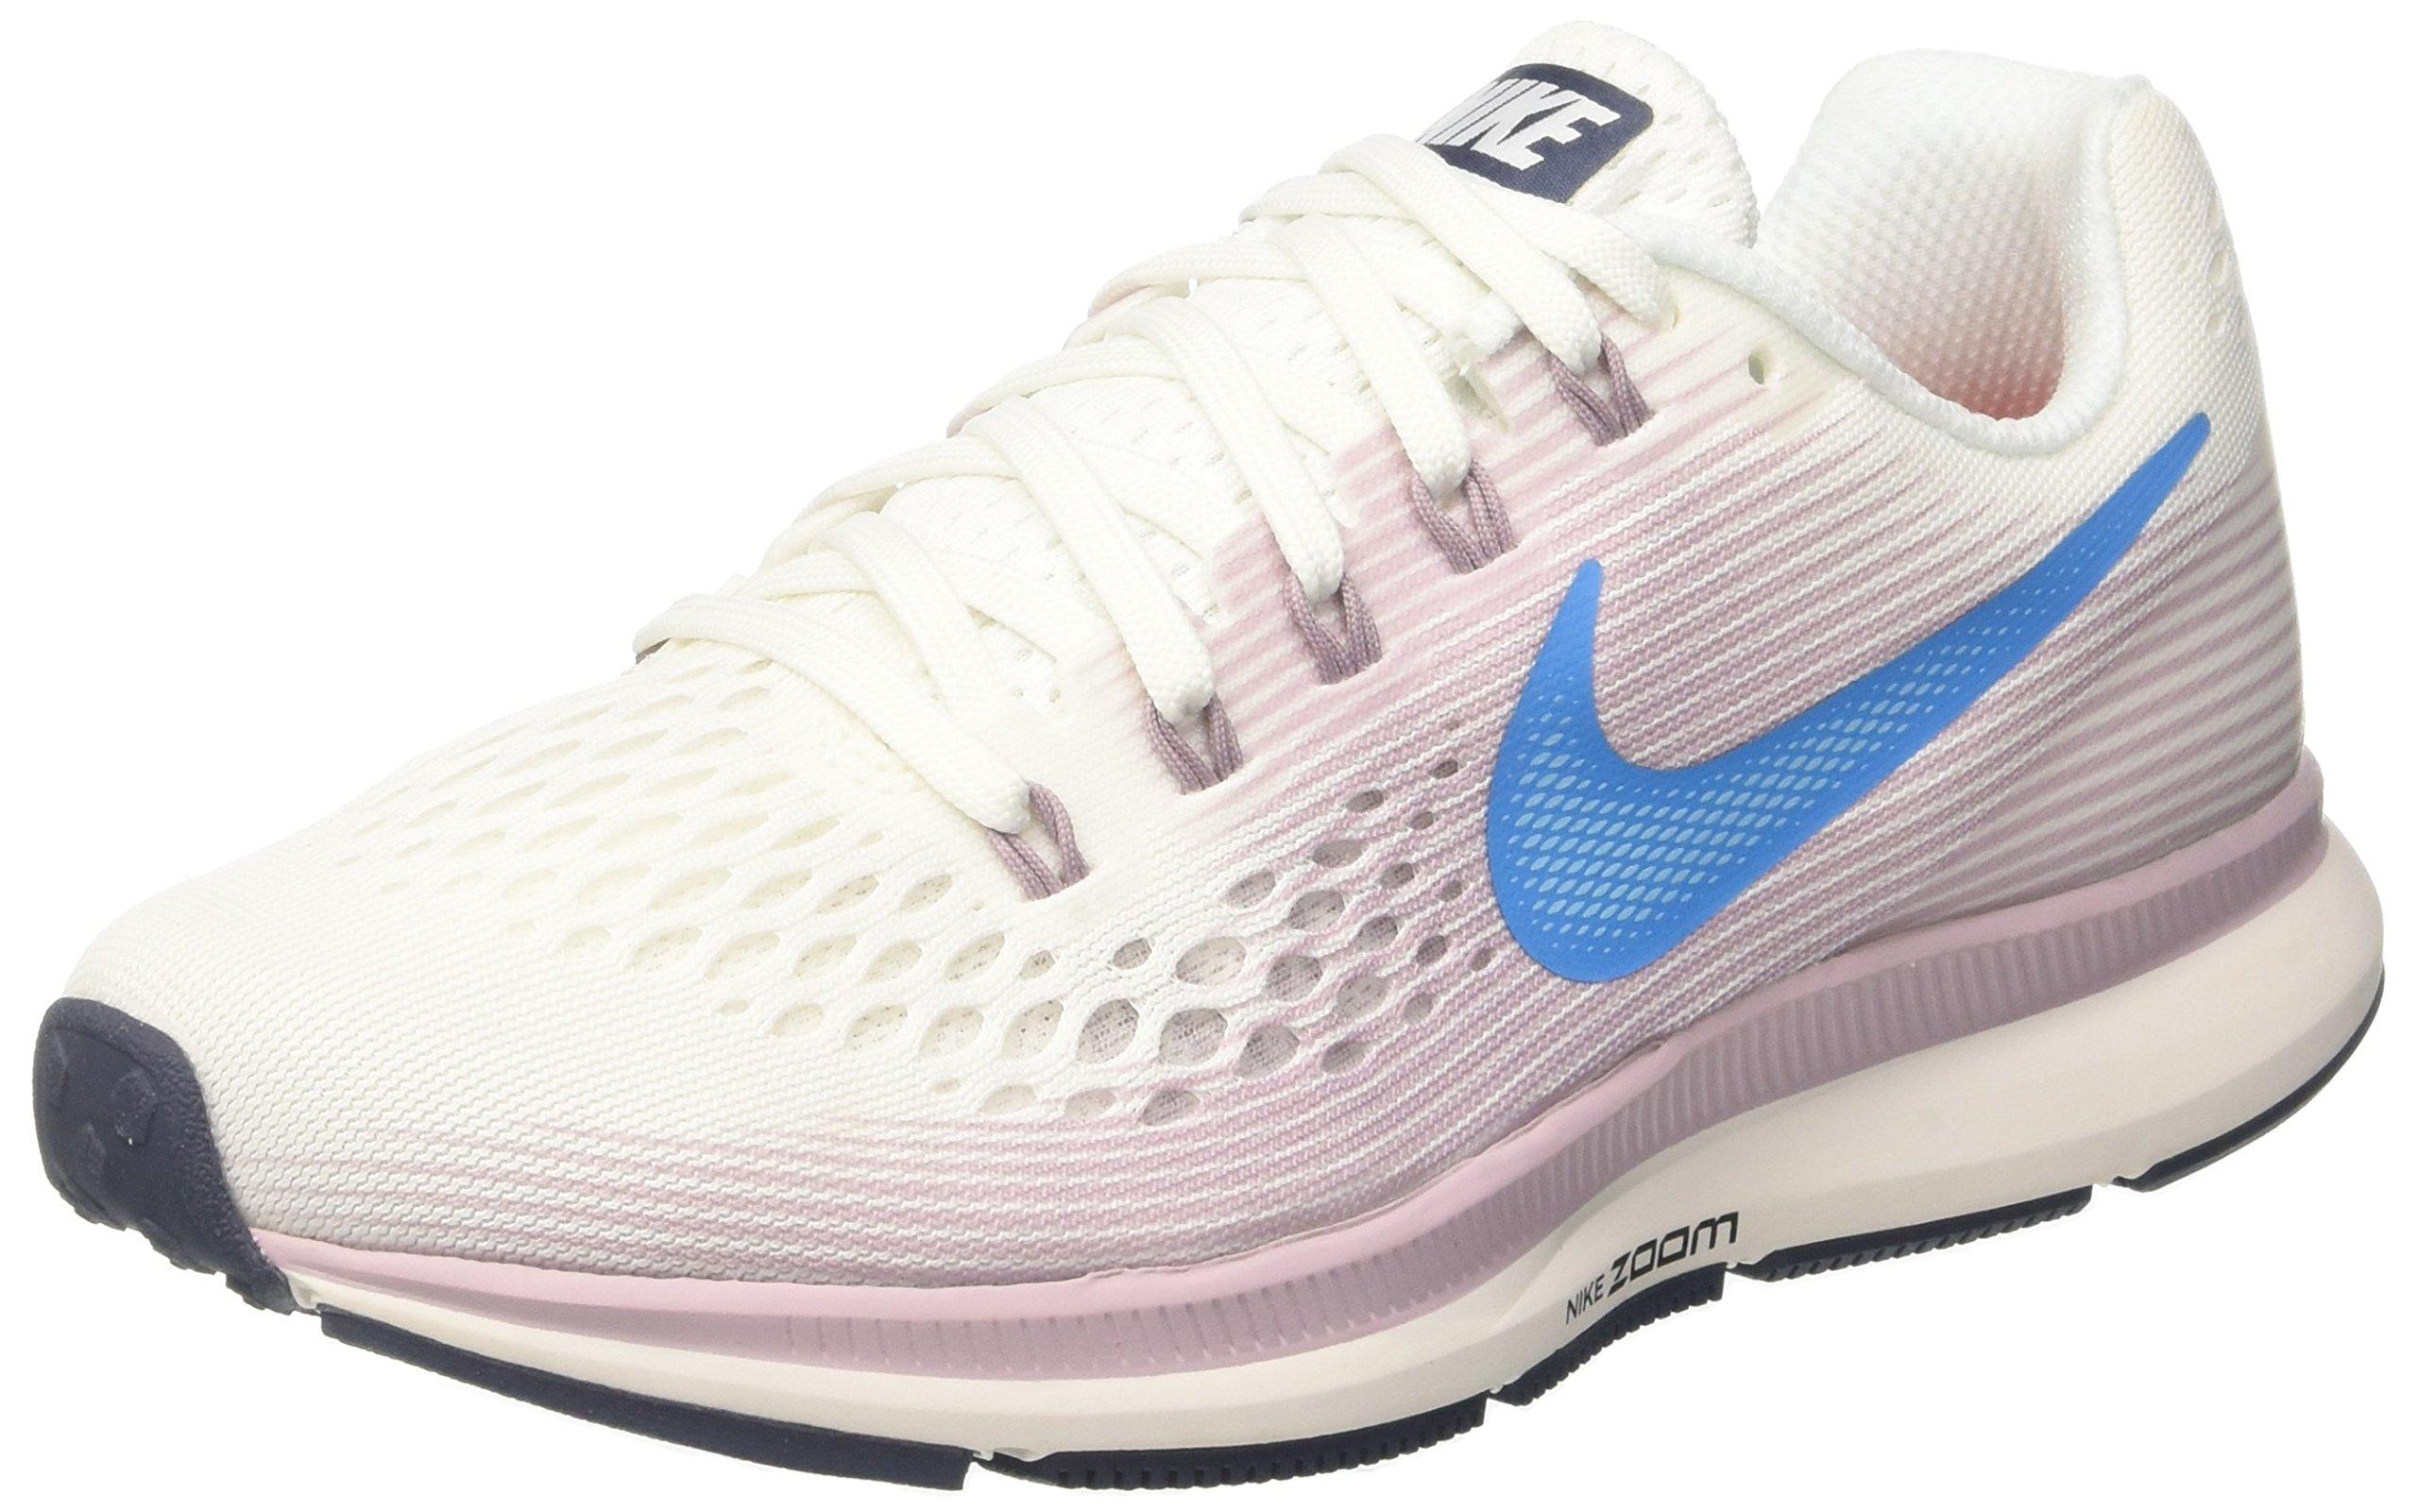 Nike Womens Air Zoom Pegasus 34 Running Trainers 880560 Sneakers Shoes (UK 3.5 US 6 EU 36.5, Summit White Equator Blue 105)